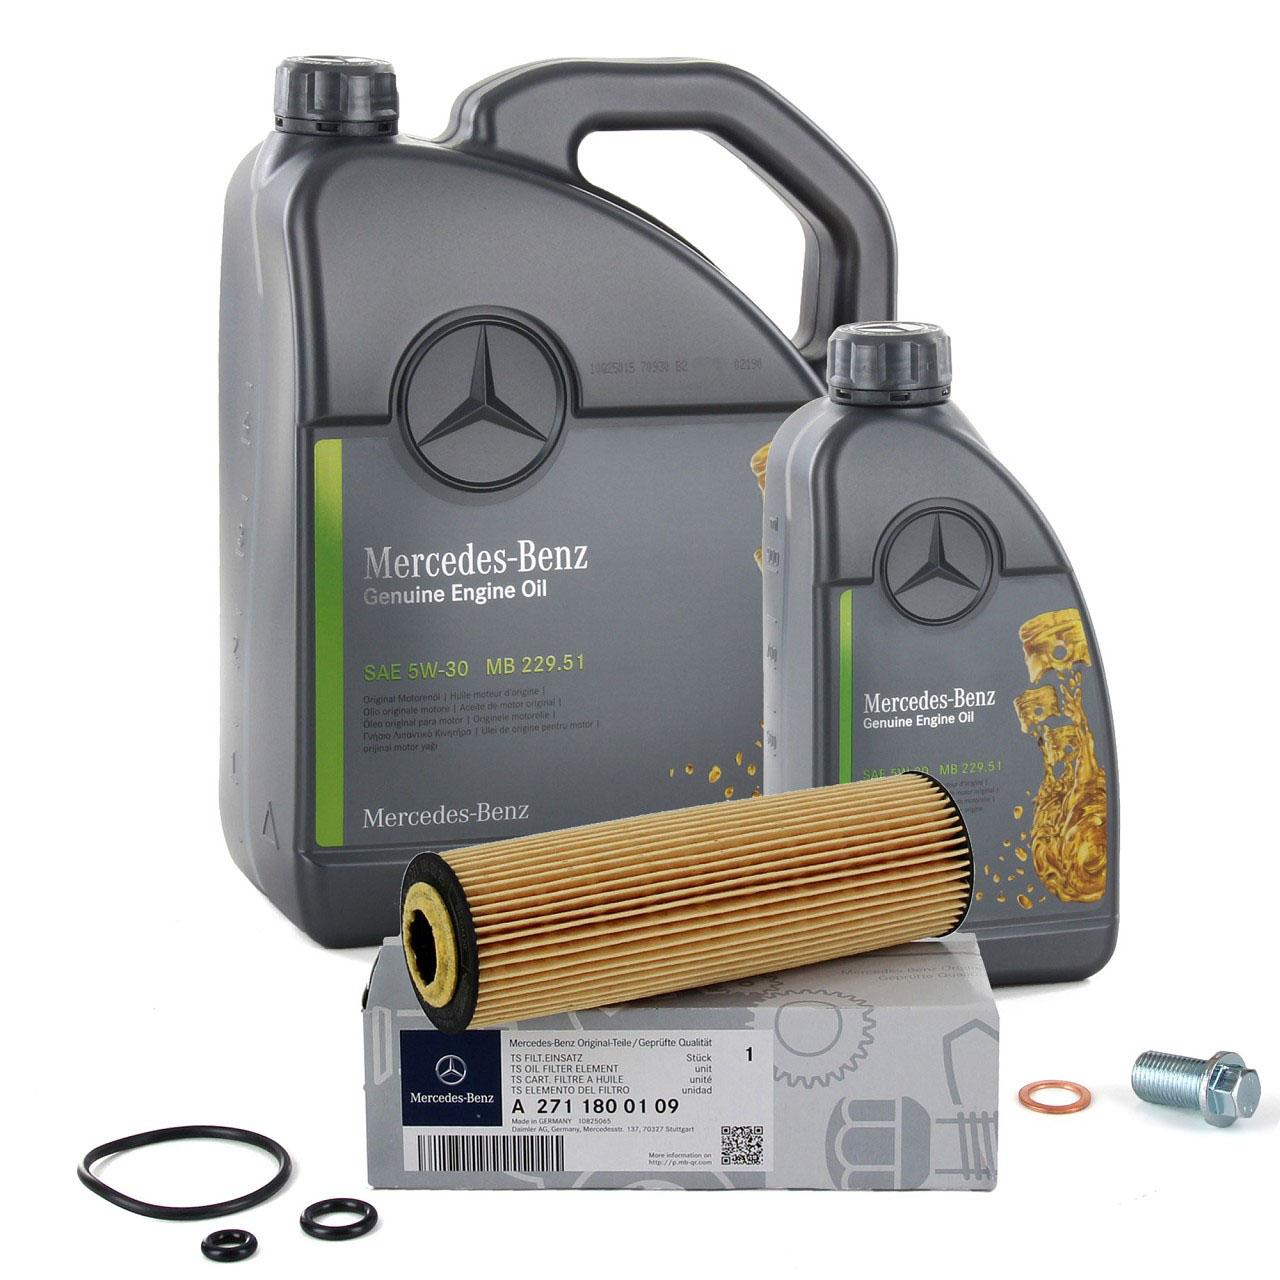 ORIGINAL Mercedes-Benz Motoröl 5W30 MB 229.51 6 Liter + Ölfilter 2711800109